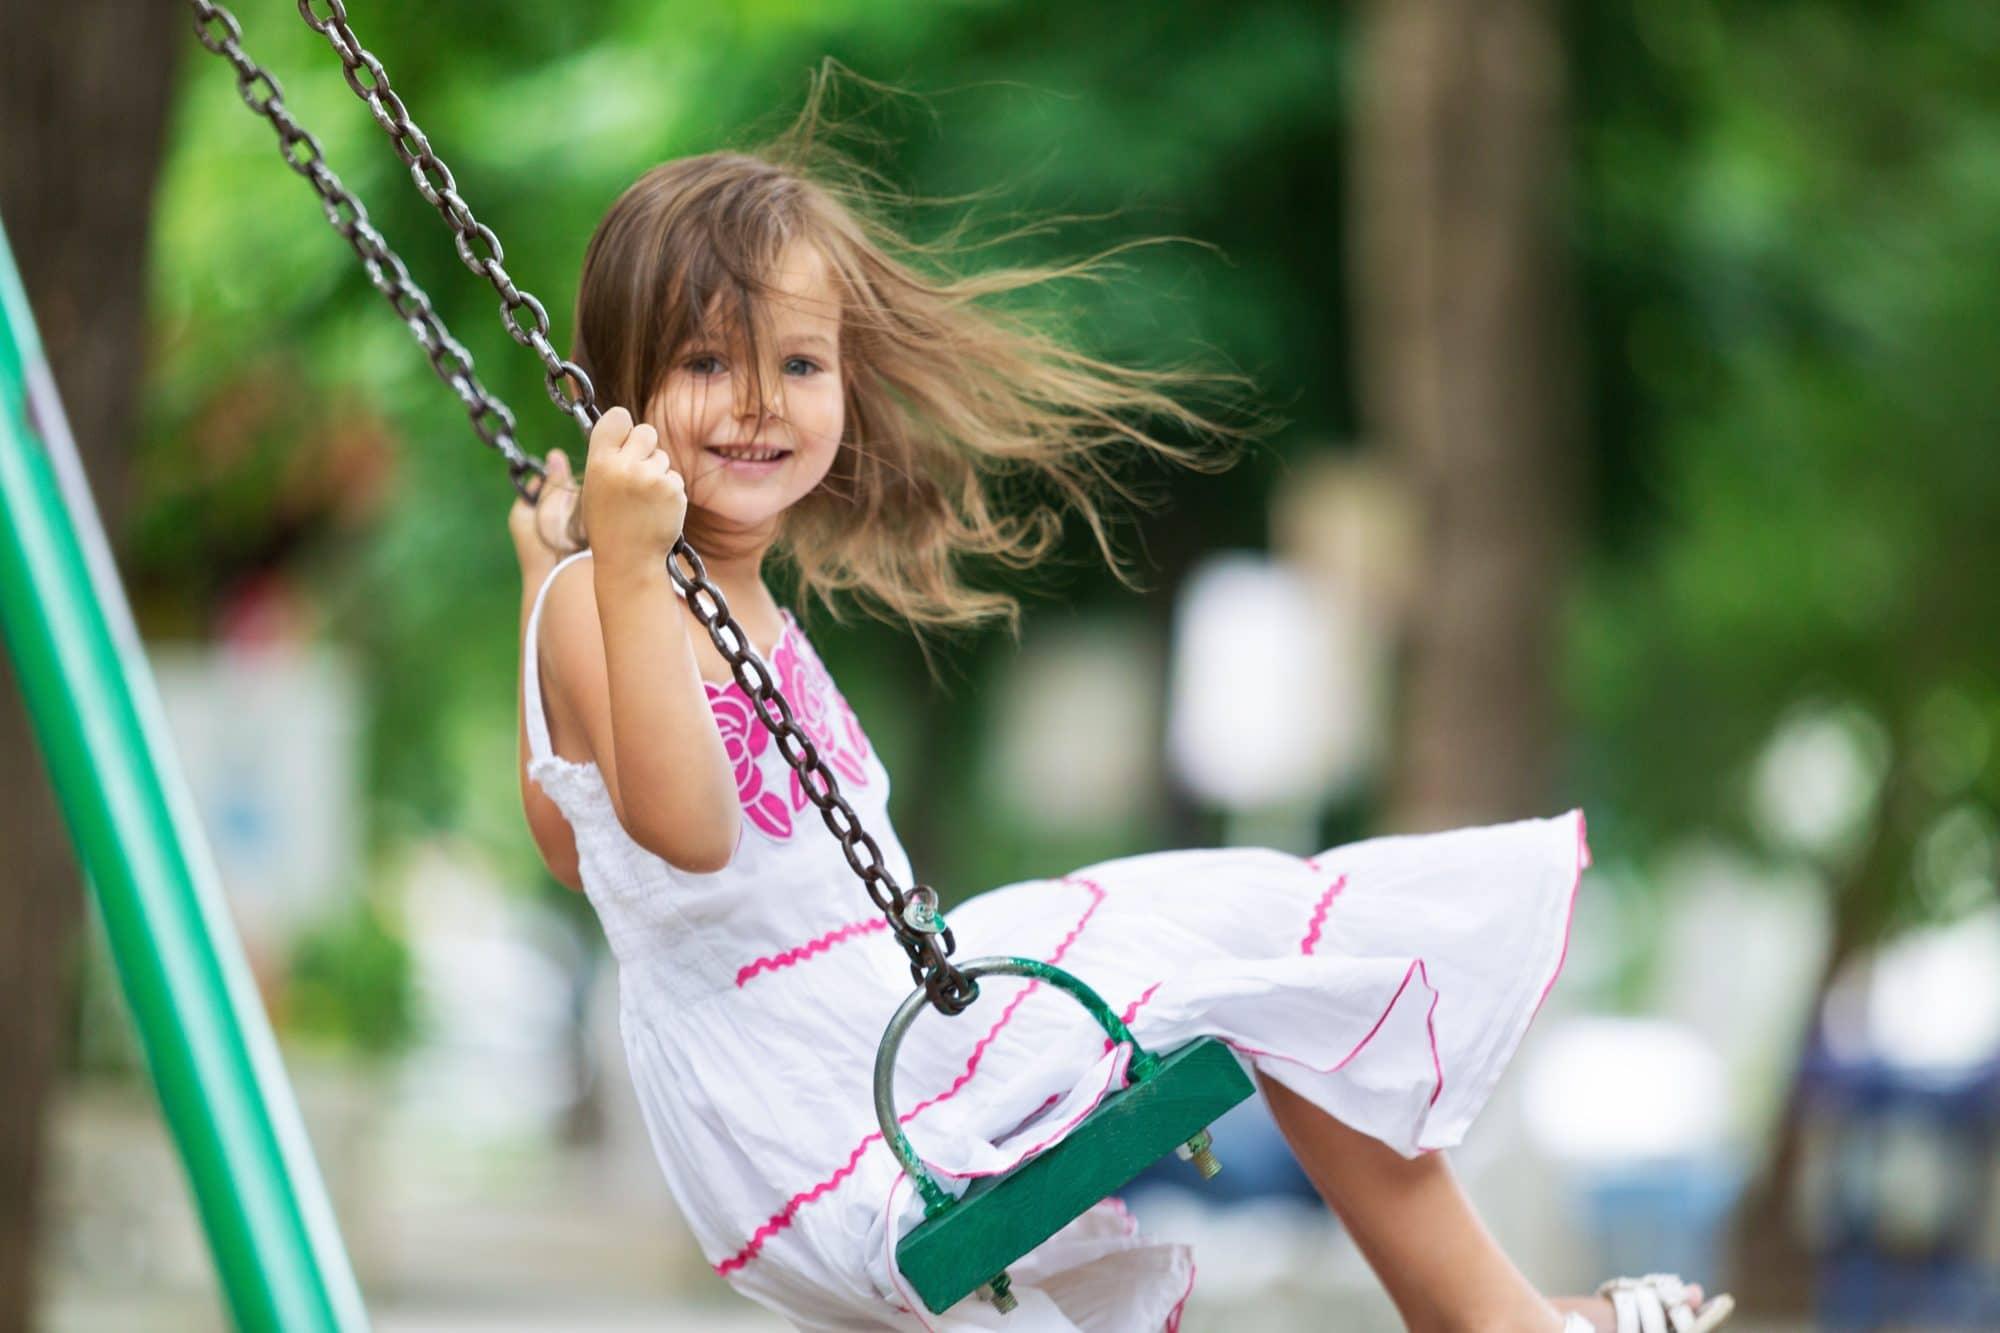 Church Playground Design: Key Considerations